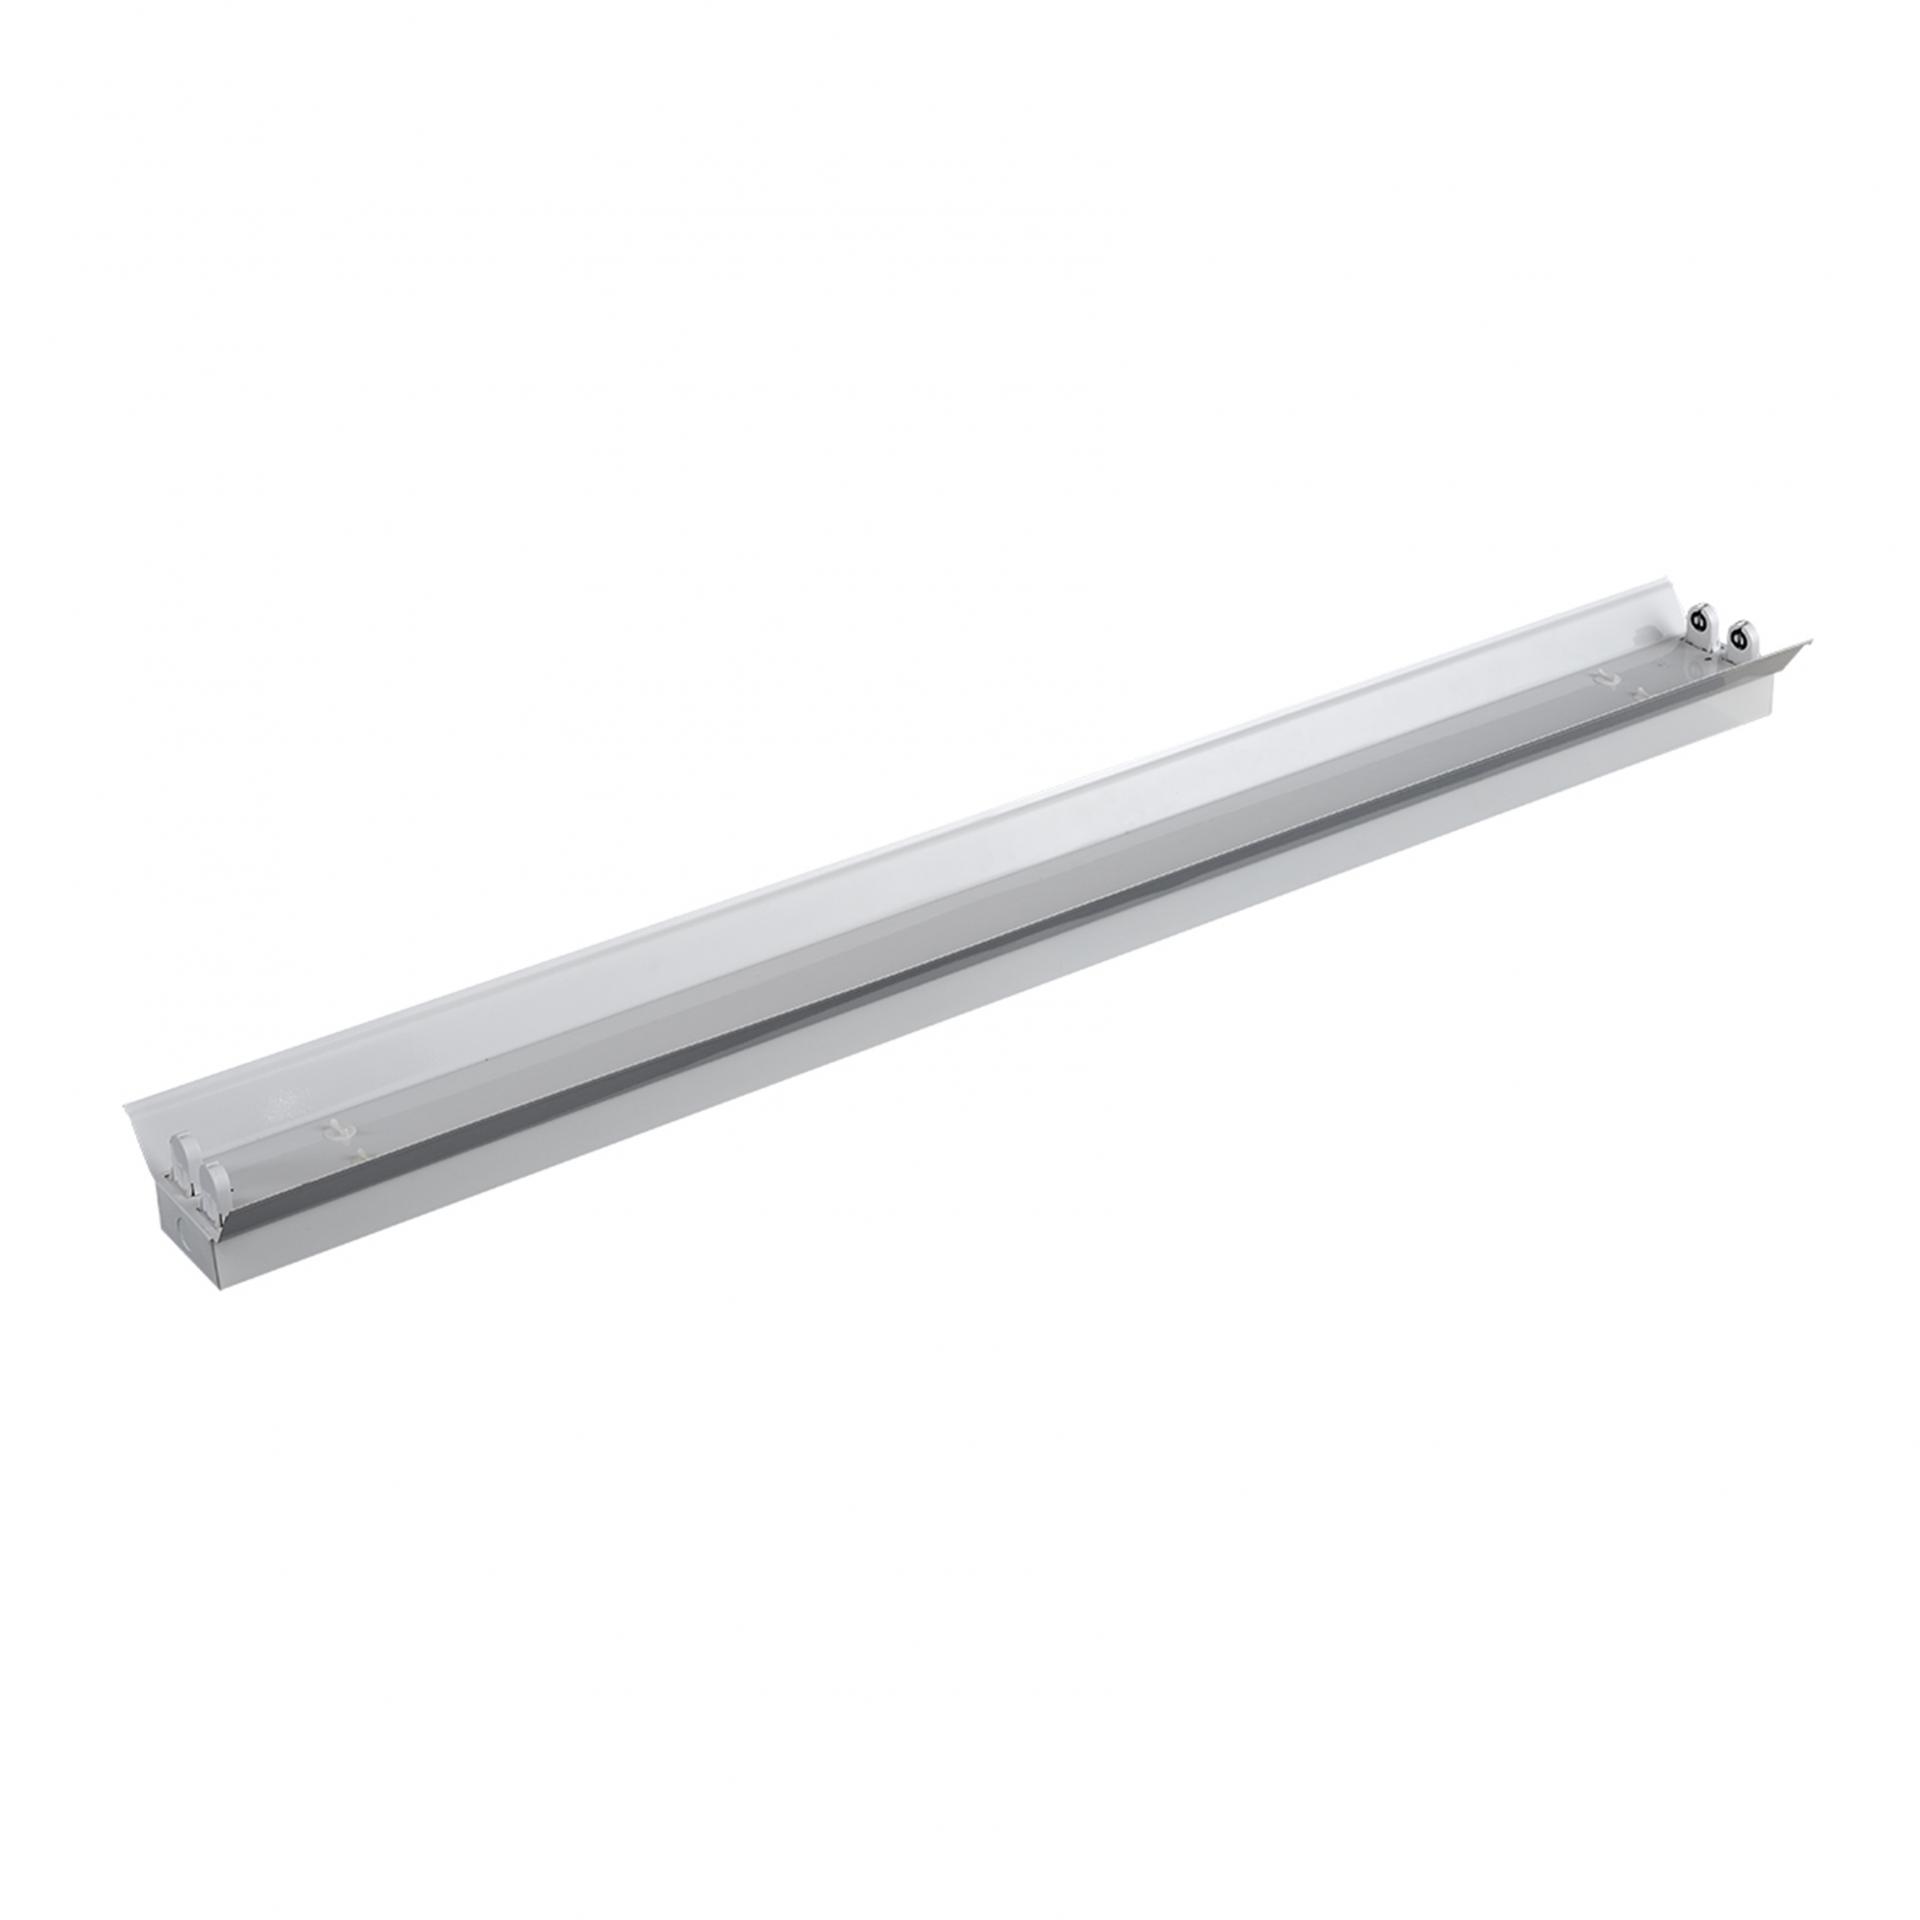 LED T8 TL Trog armatuur met reflector 120cm en 150cm - G13 - IP22 niet waterdicht